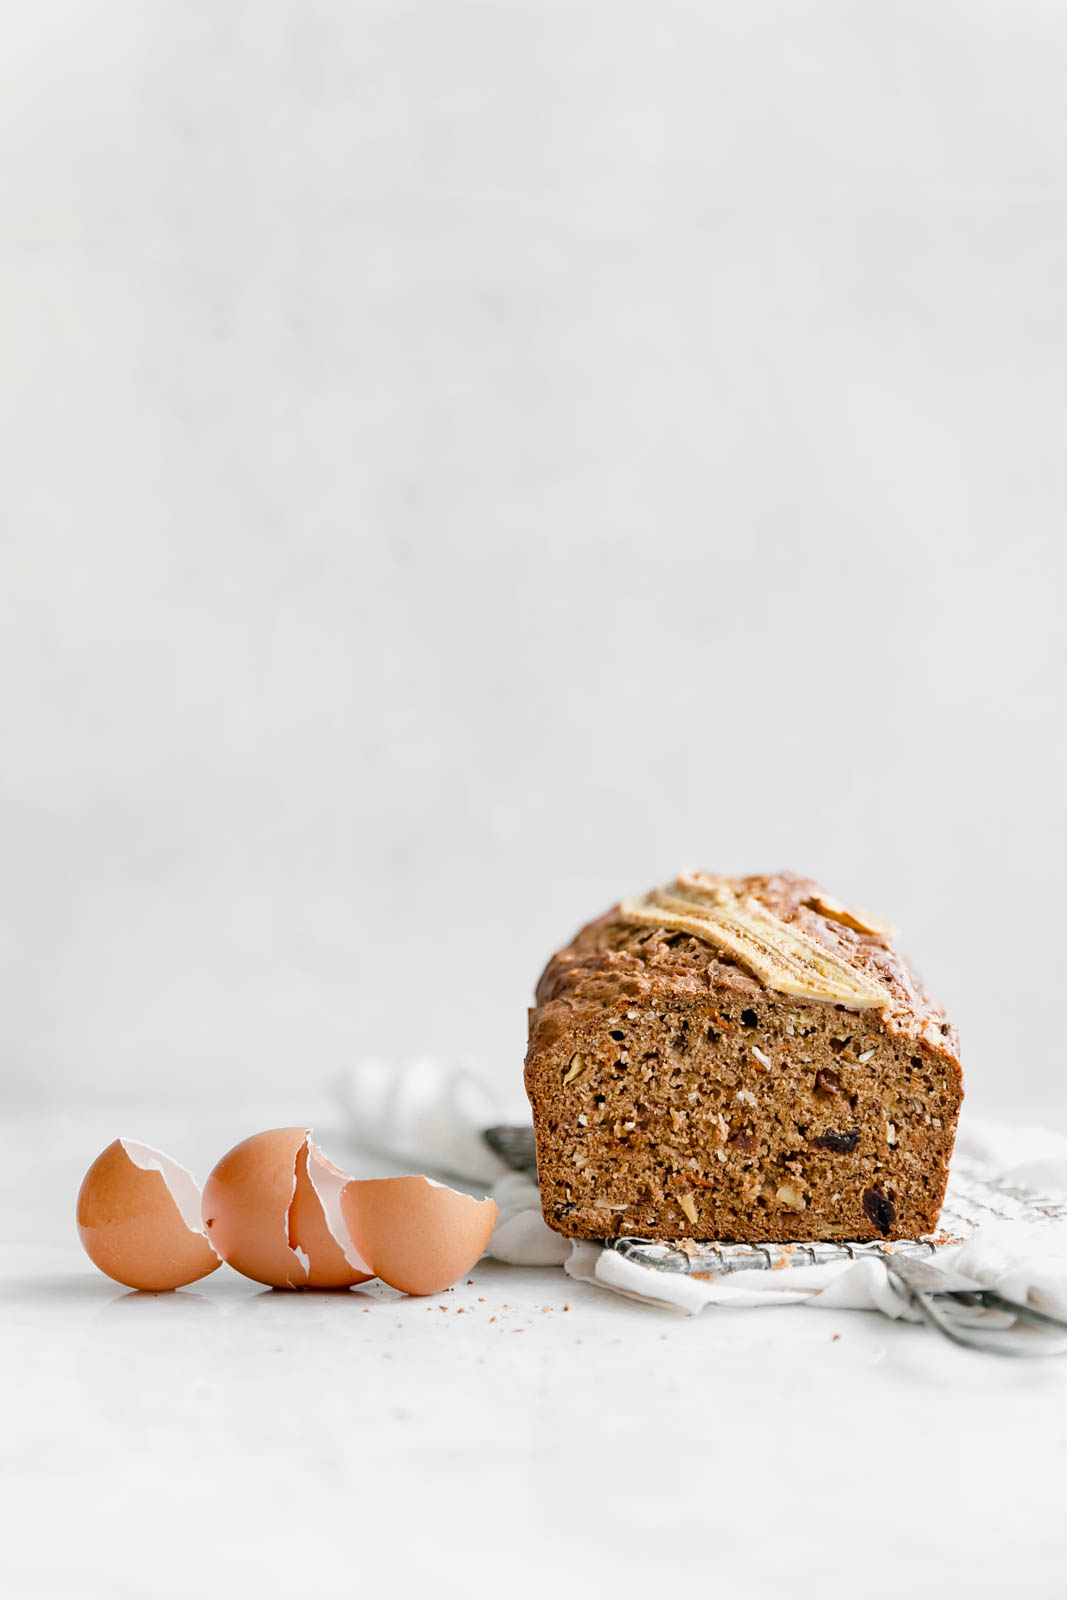 carrot cake banana bread with egg shells